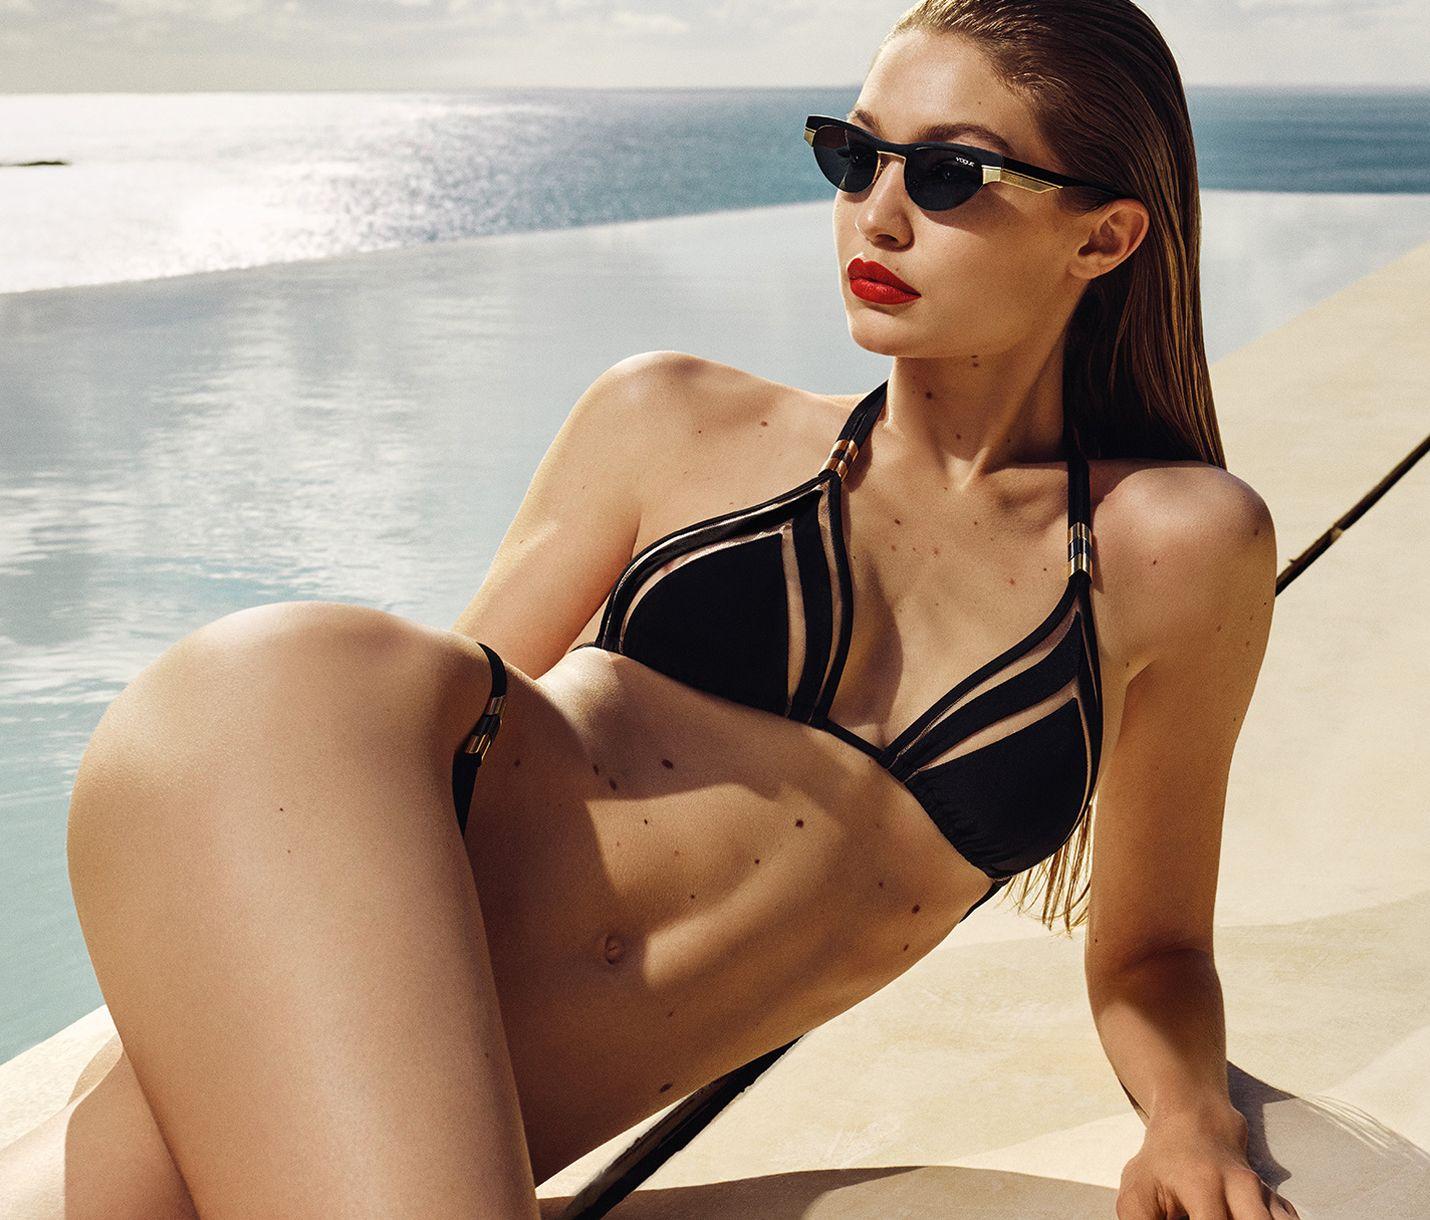 Gigi Hadid For Vogue Shoot